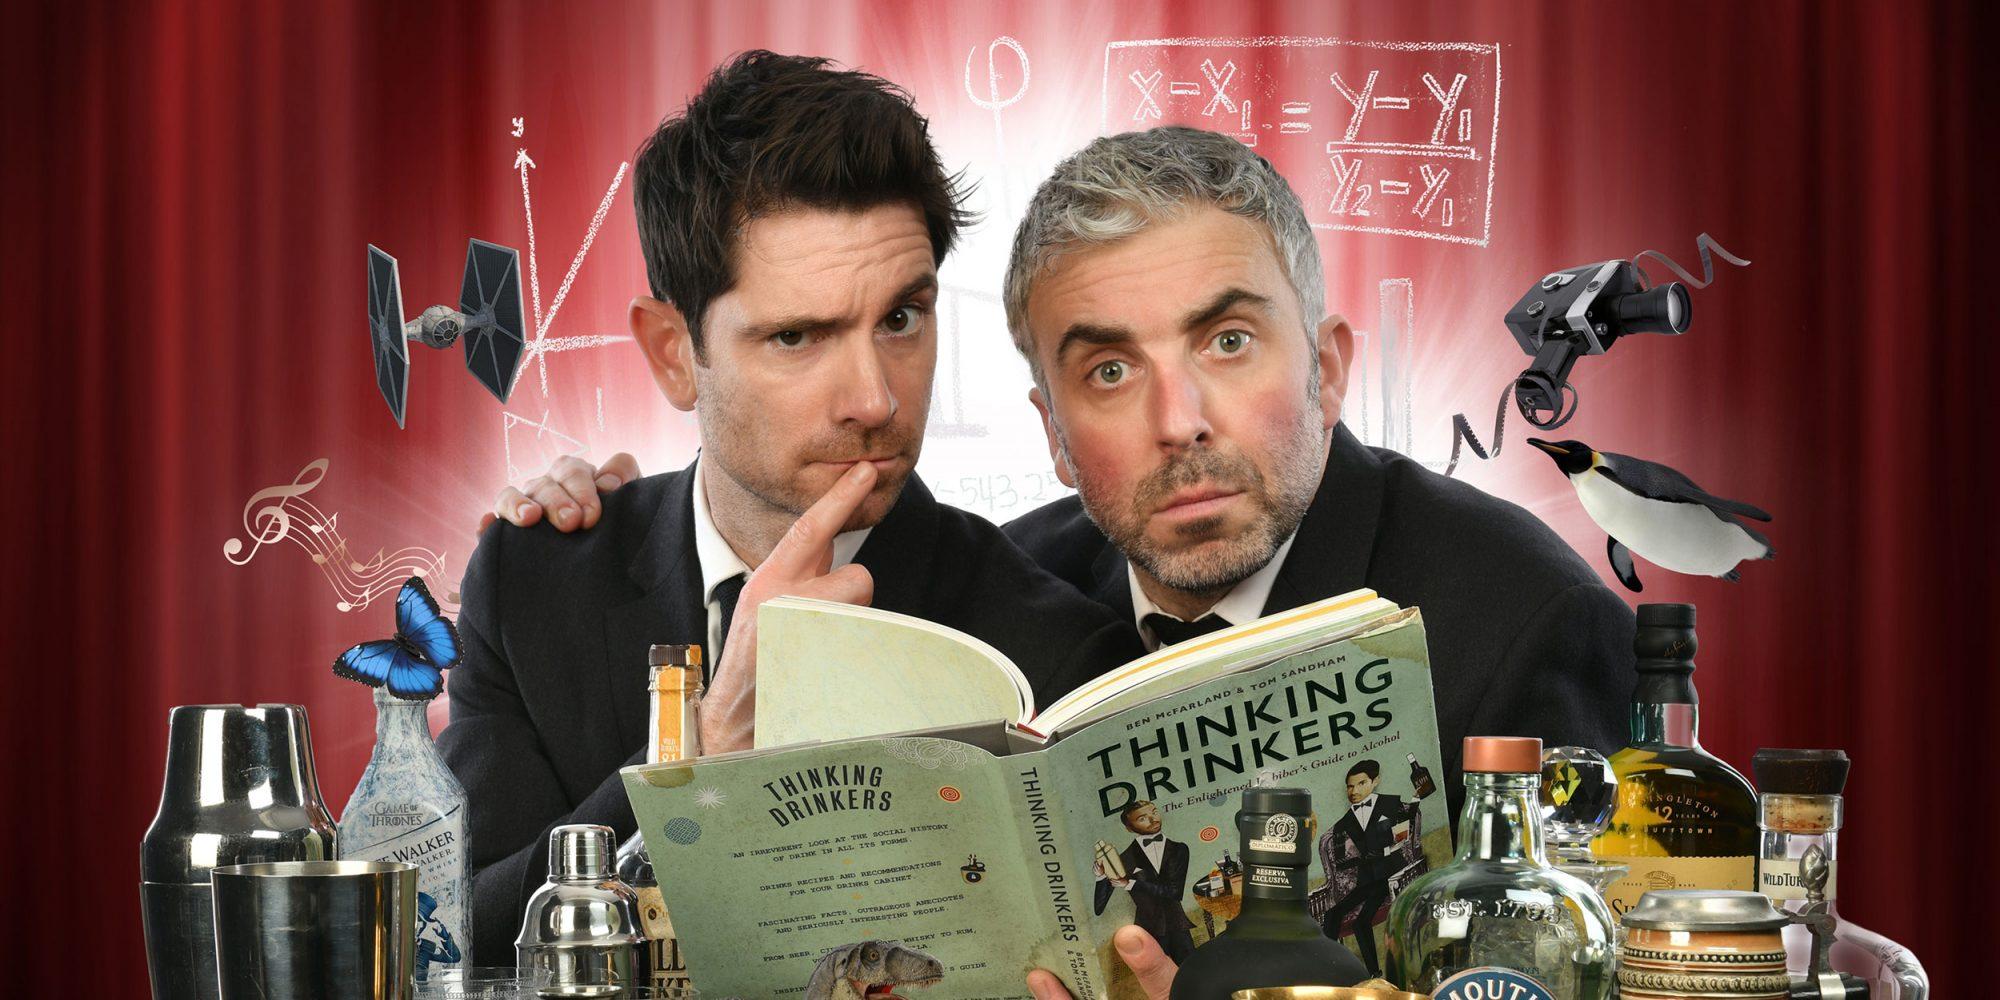 Thinking Drinkers: Pub Quiz